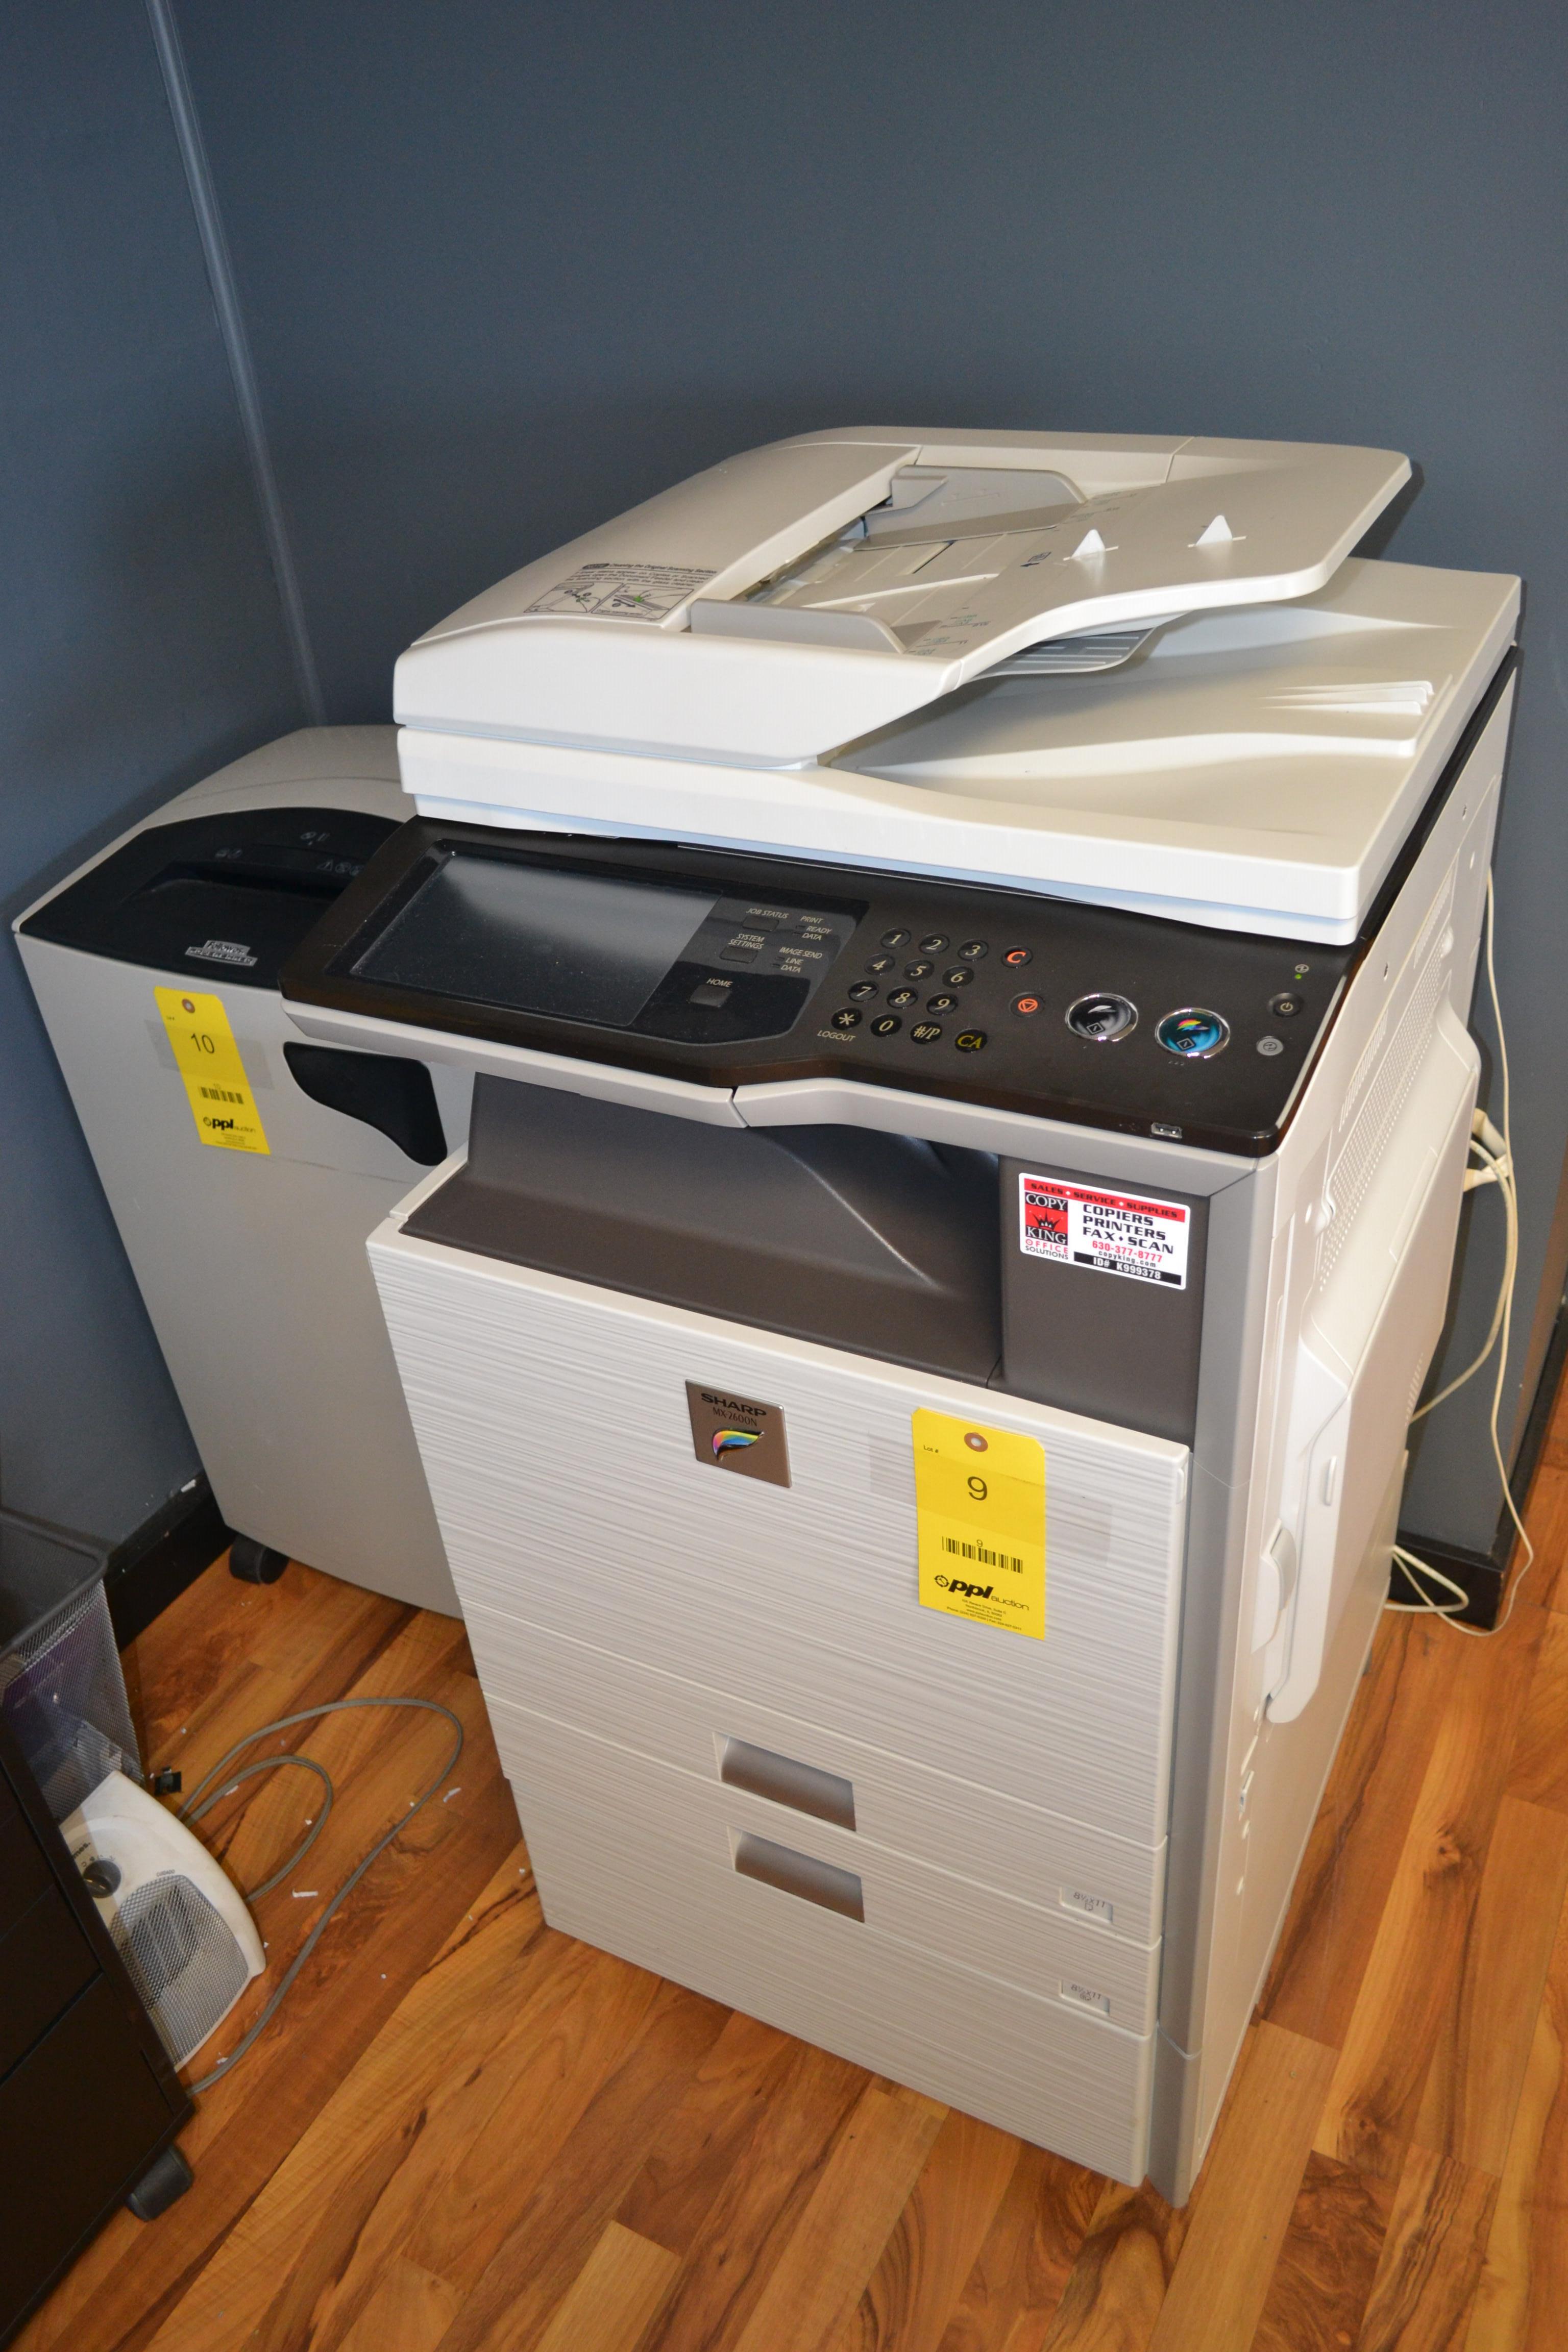 Sharp Copier/Scanner Model MX2600N